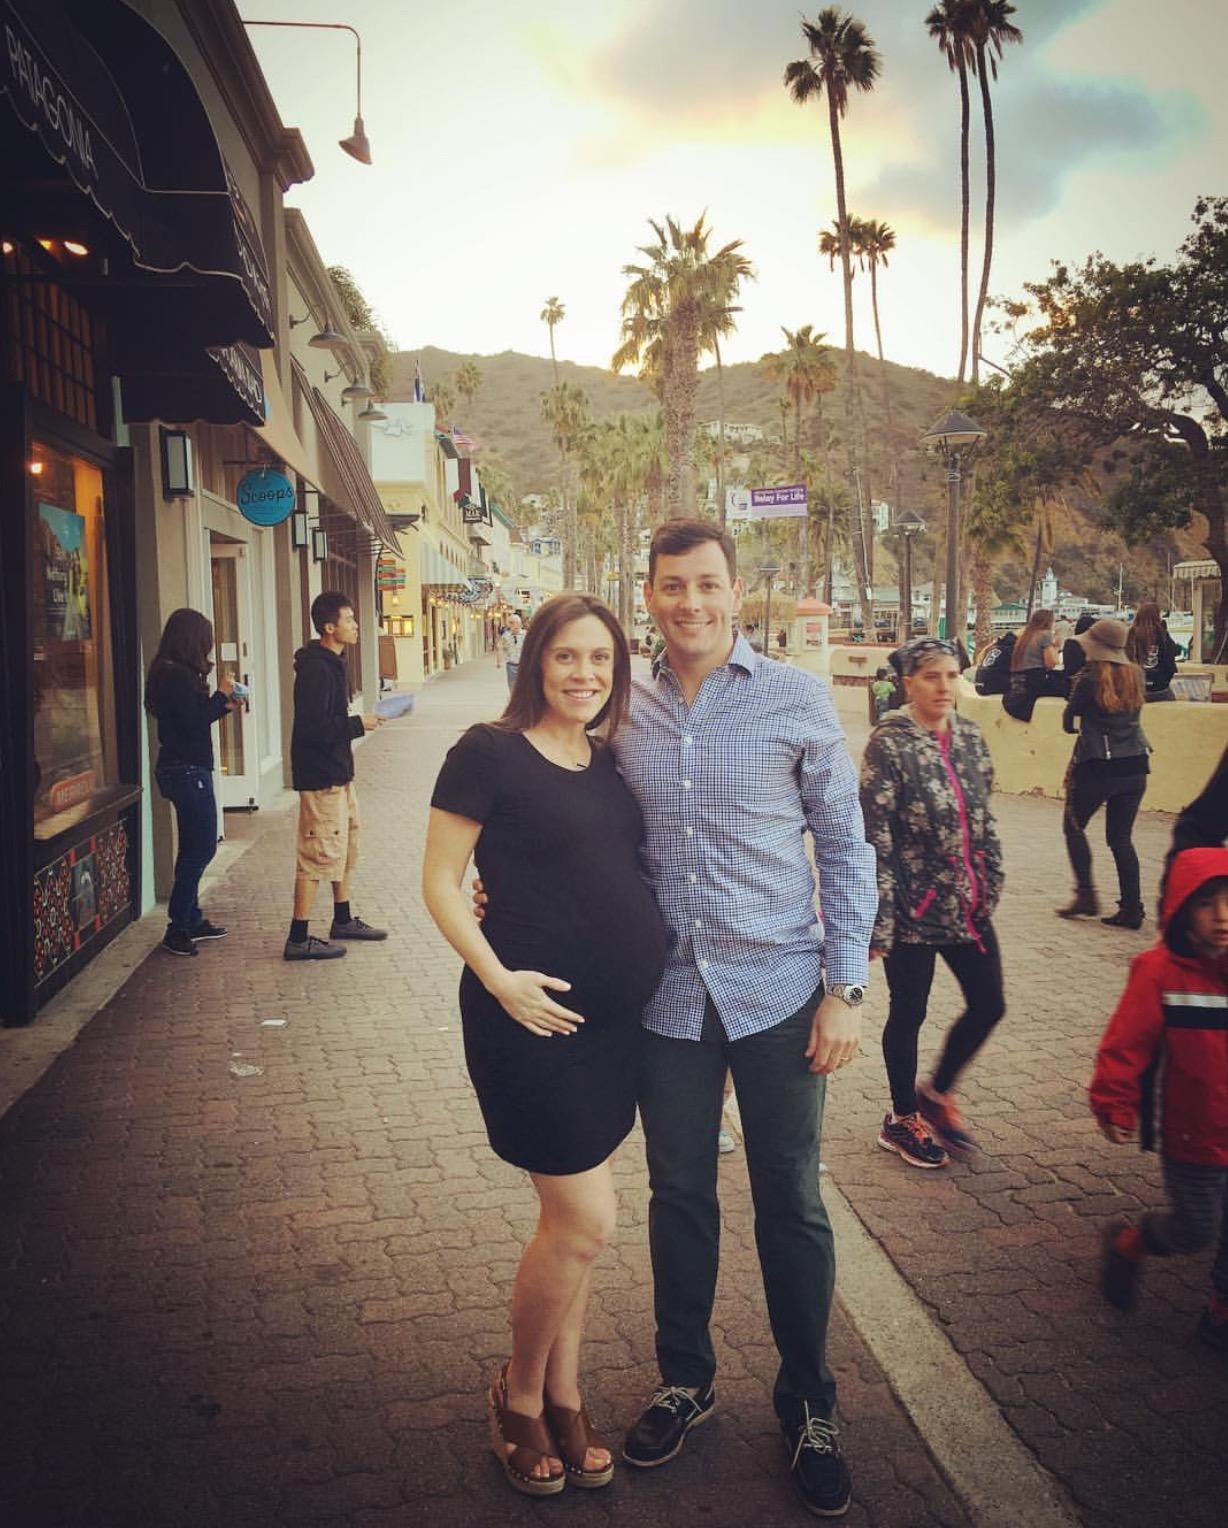 Downtown Avalon, Catalina Island